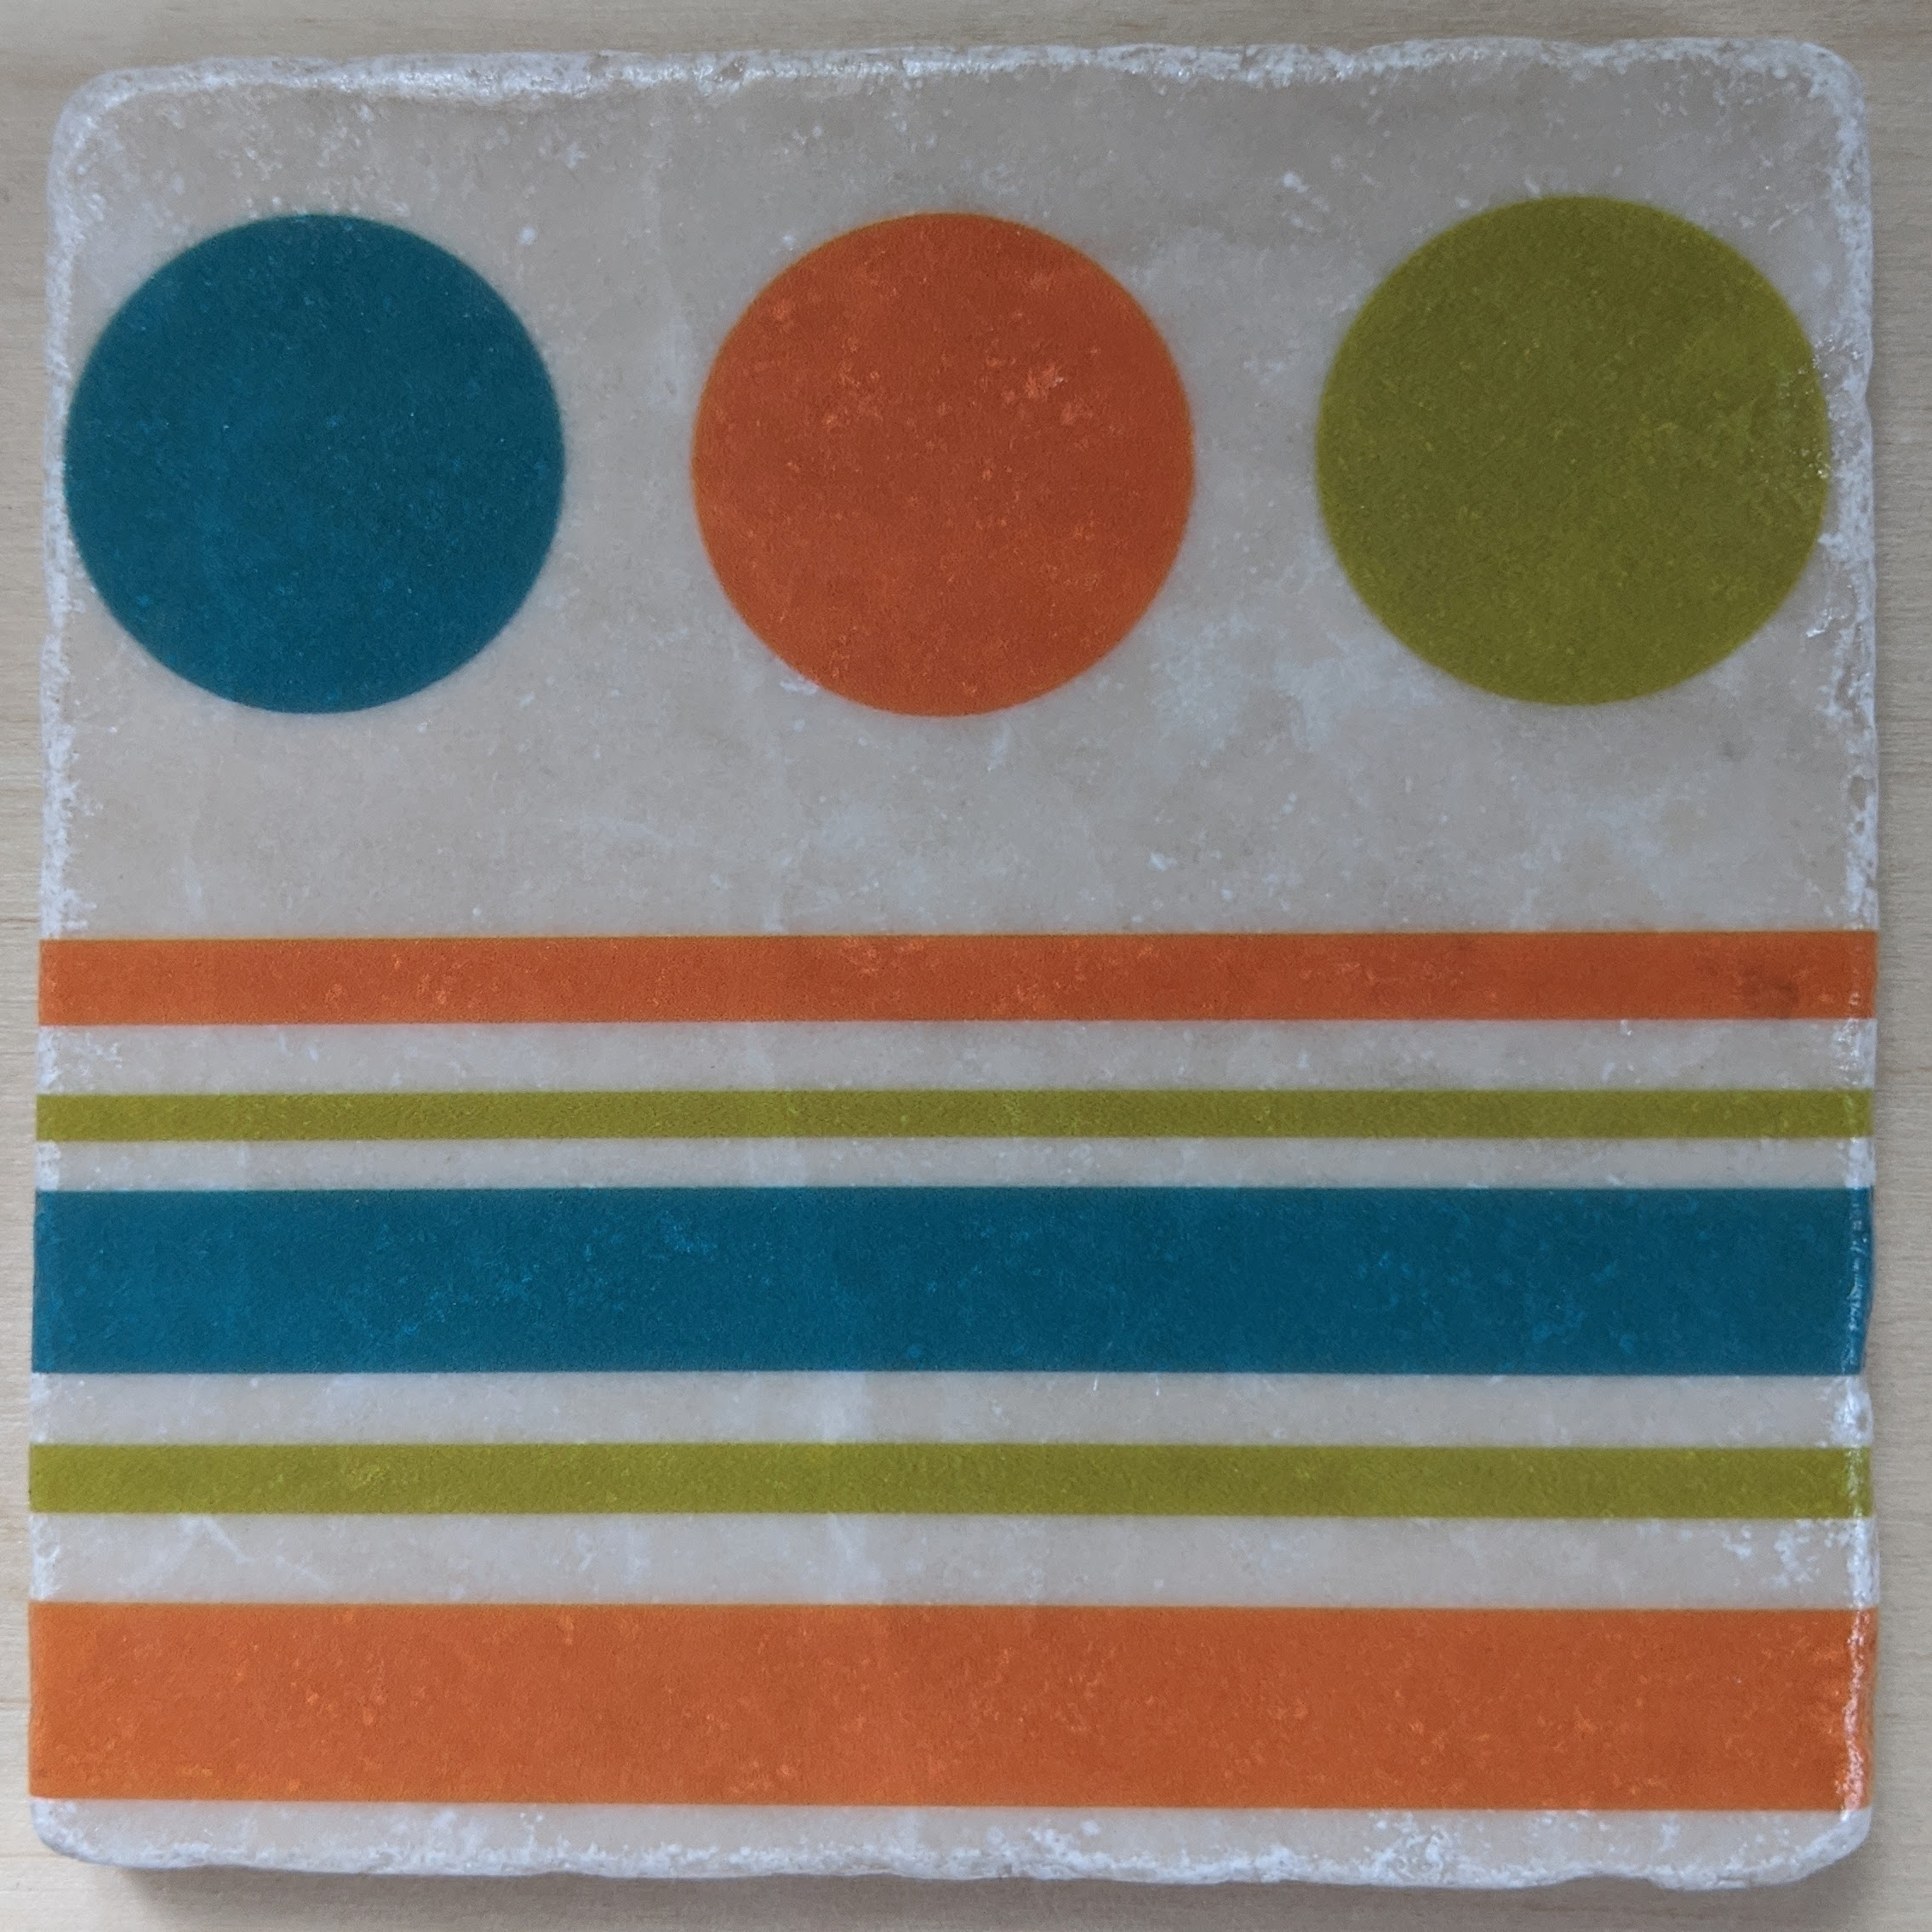 MCM-Marble Art Coasters Circles-01A-1